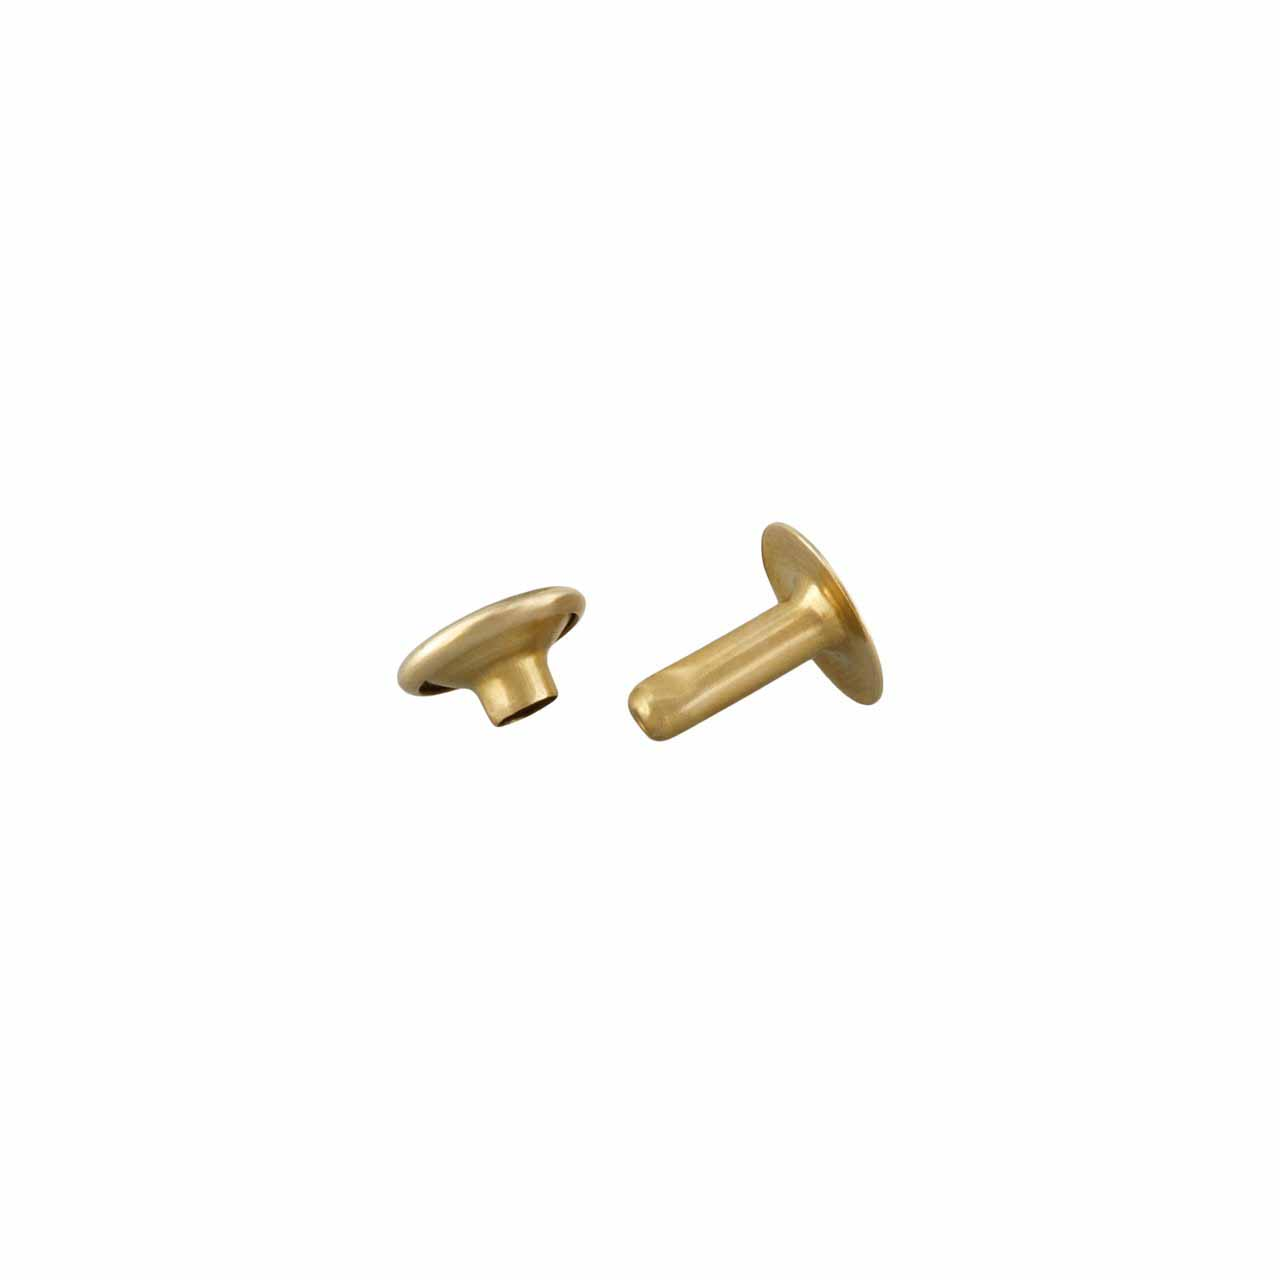 Two Piece Rivet Brass